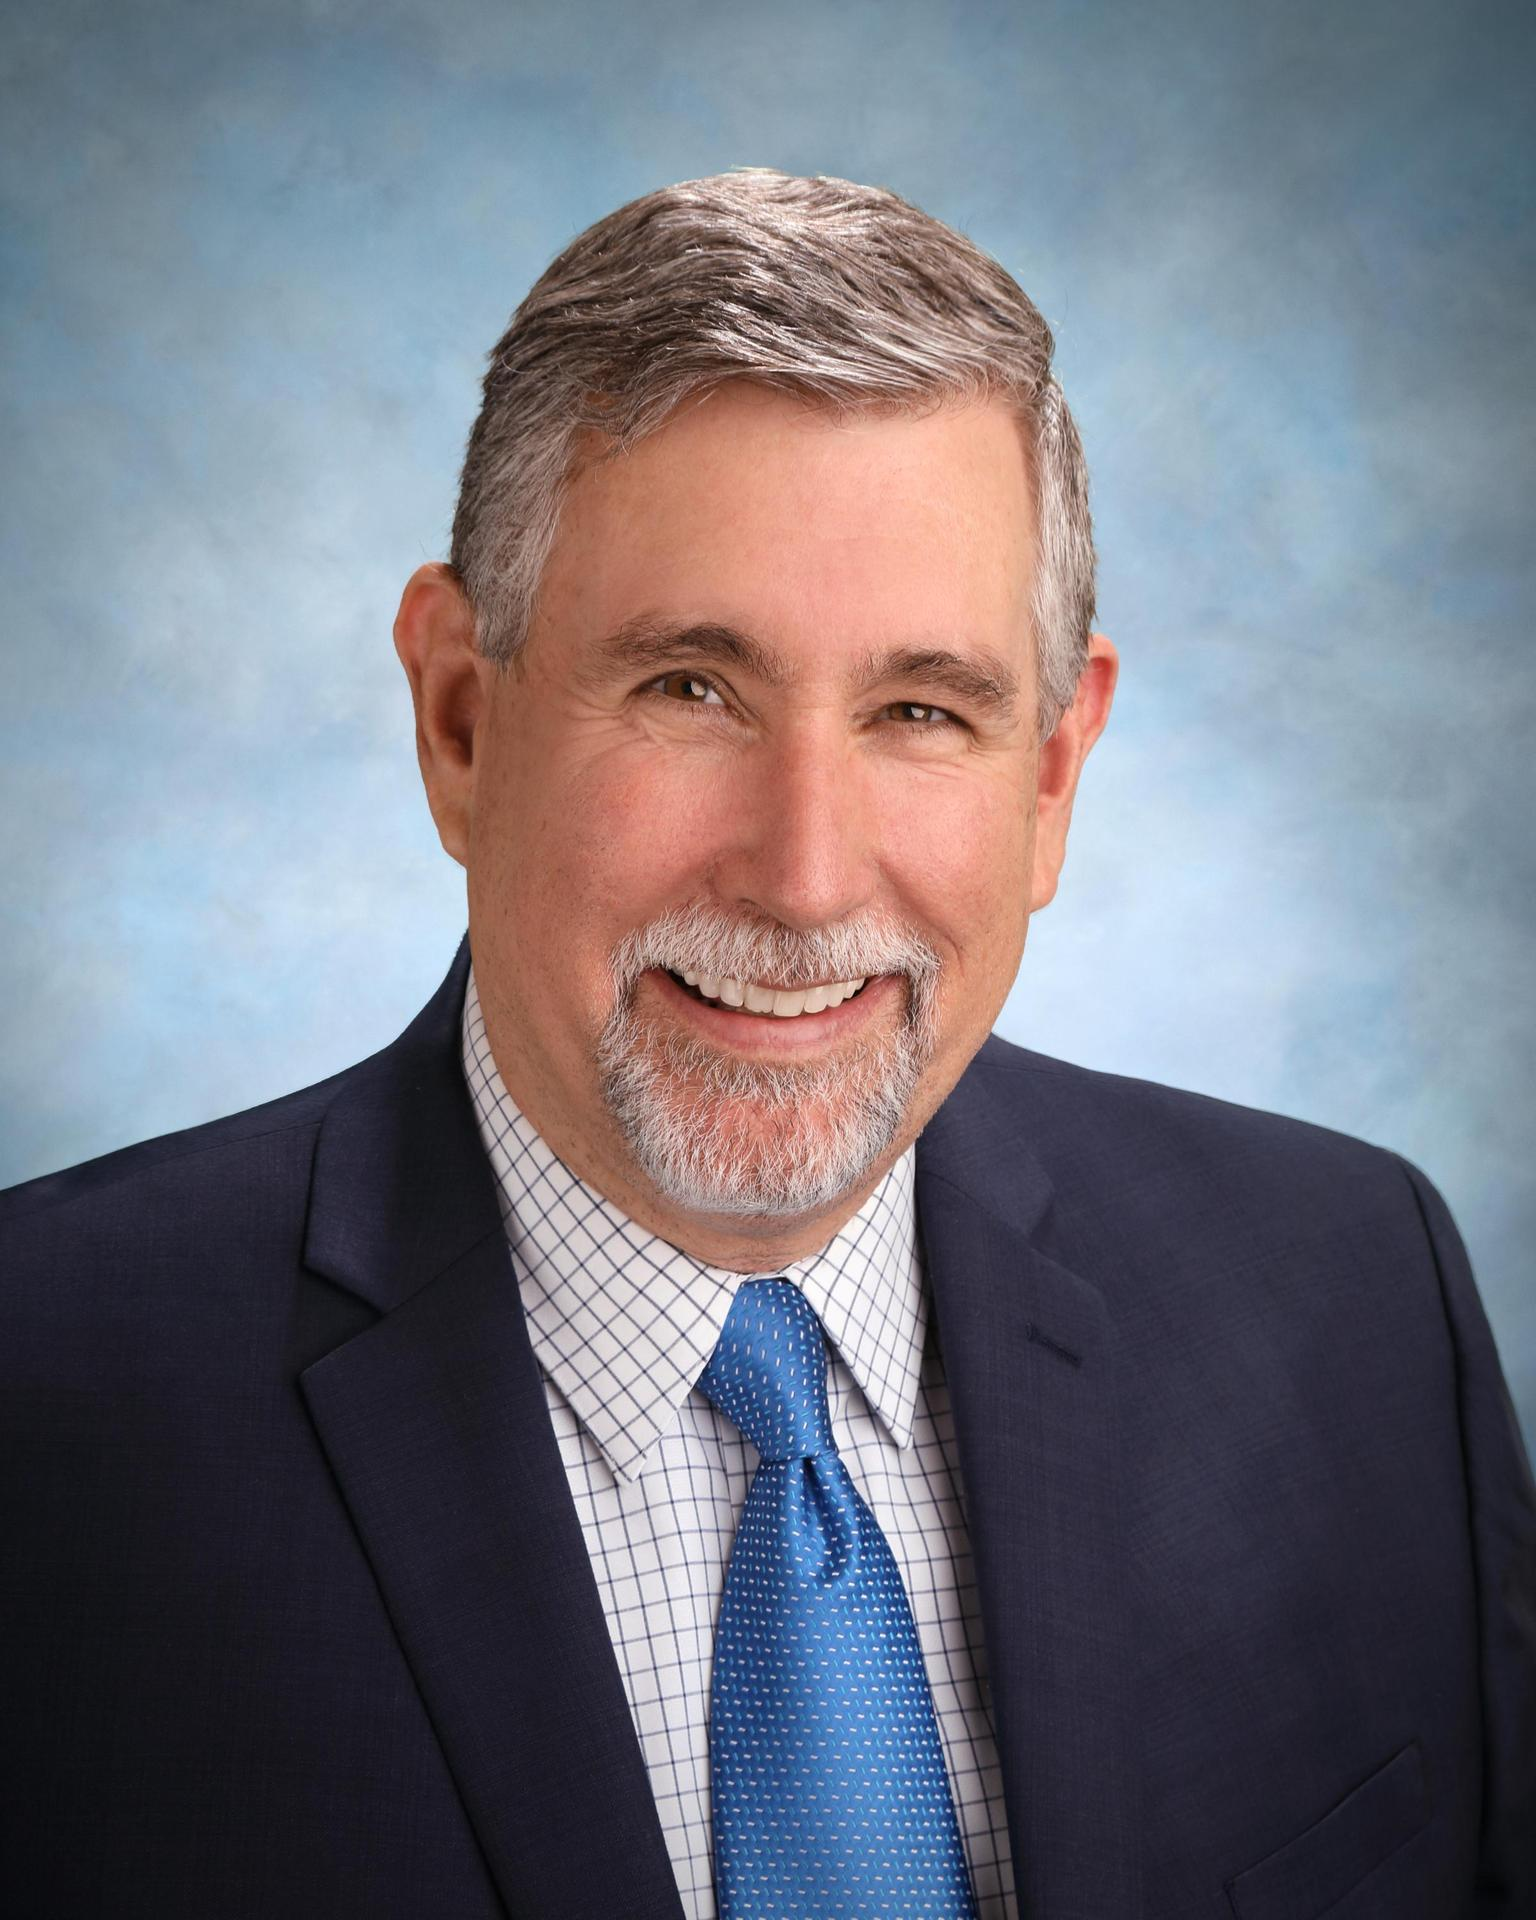 Superintendent Daniel Moore